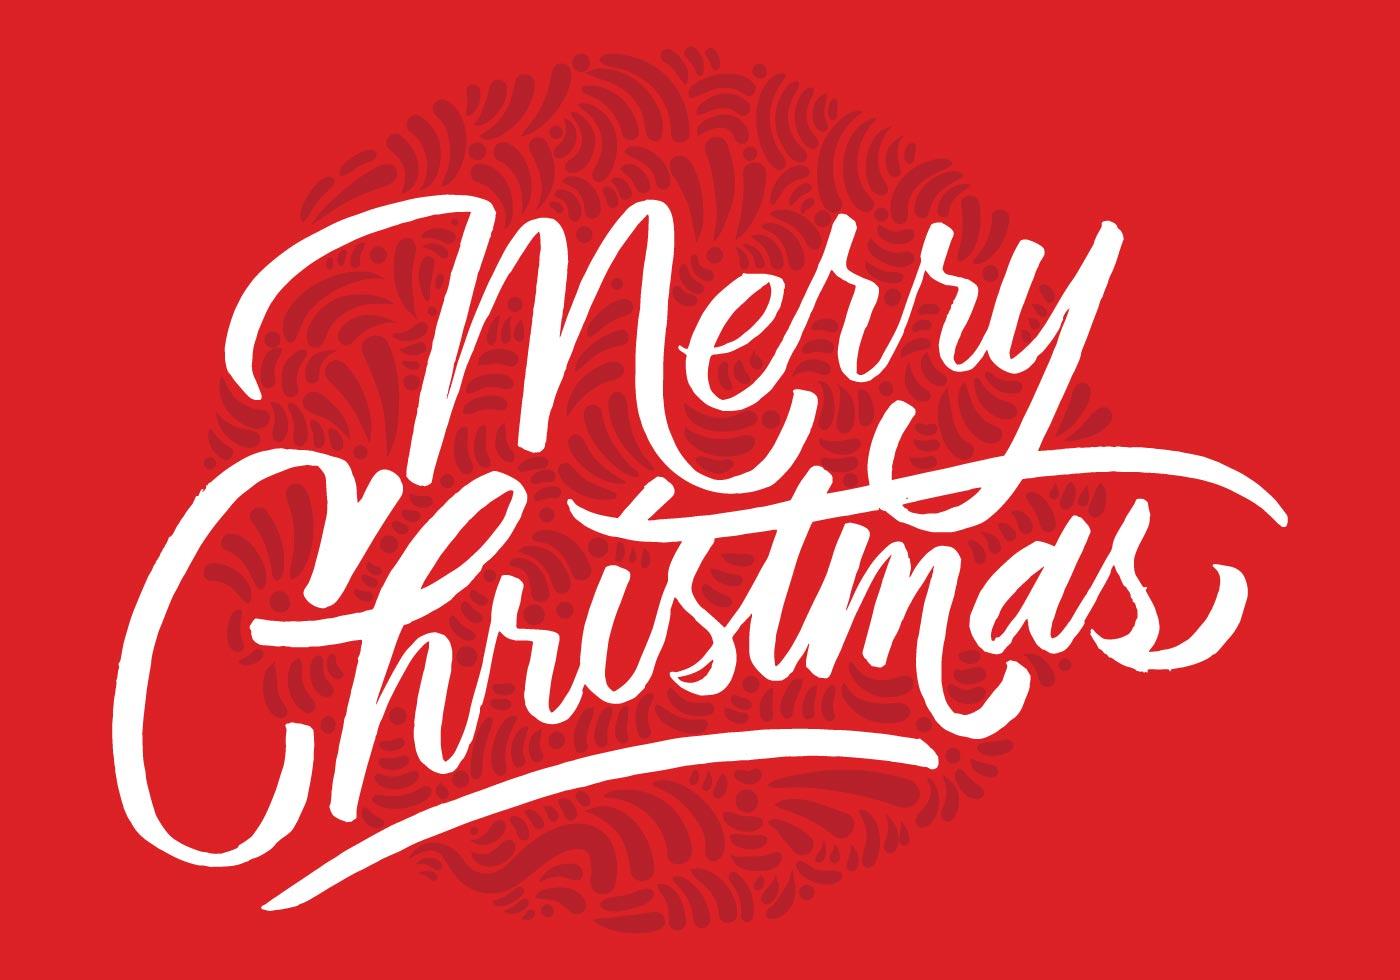 Merry Christmas Brush Script Vector Download Free Vector